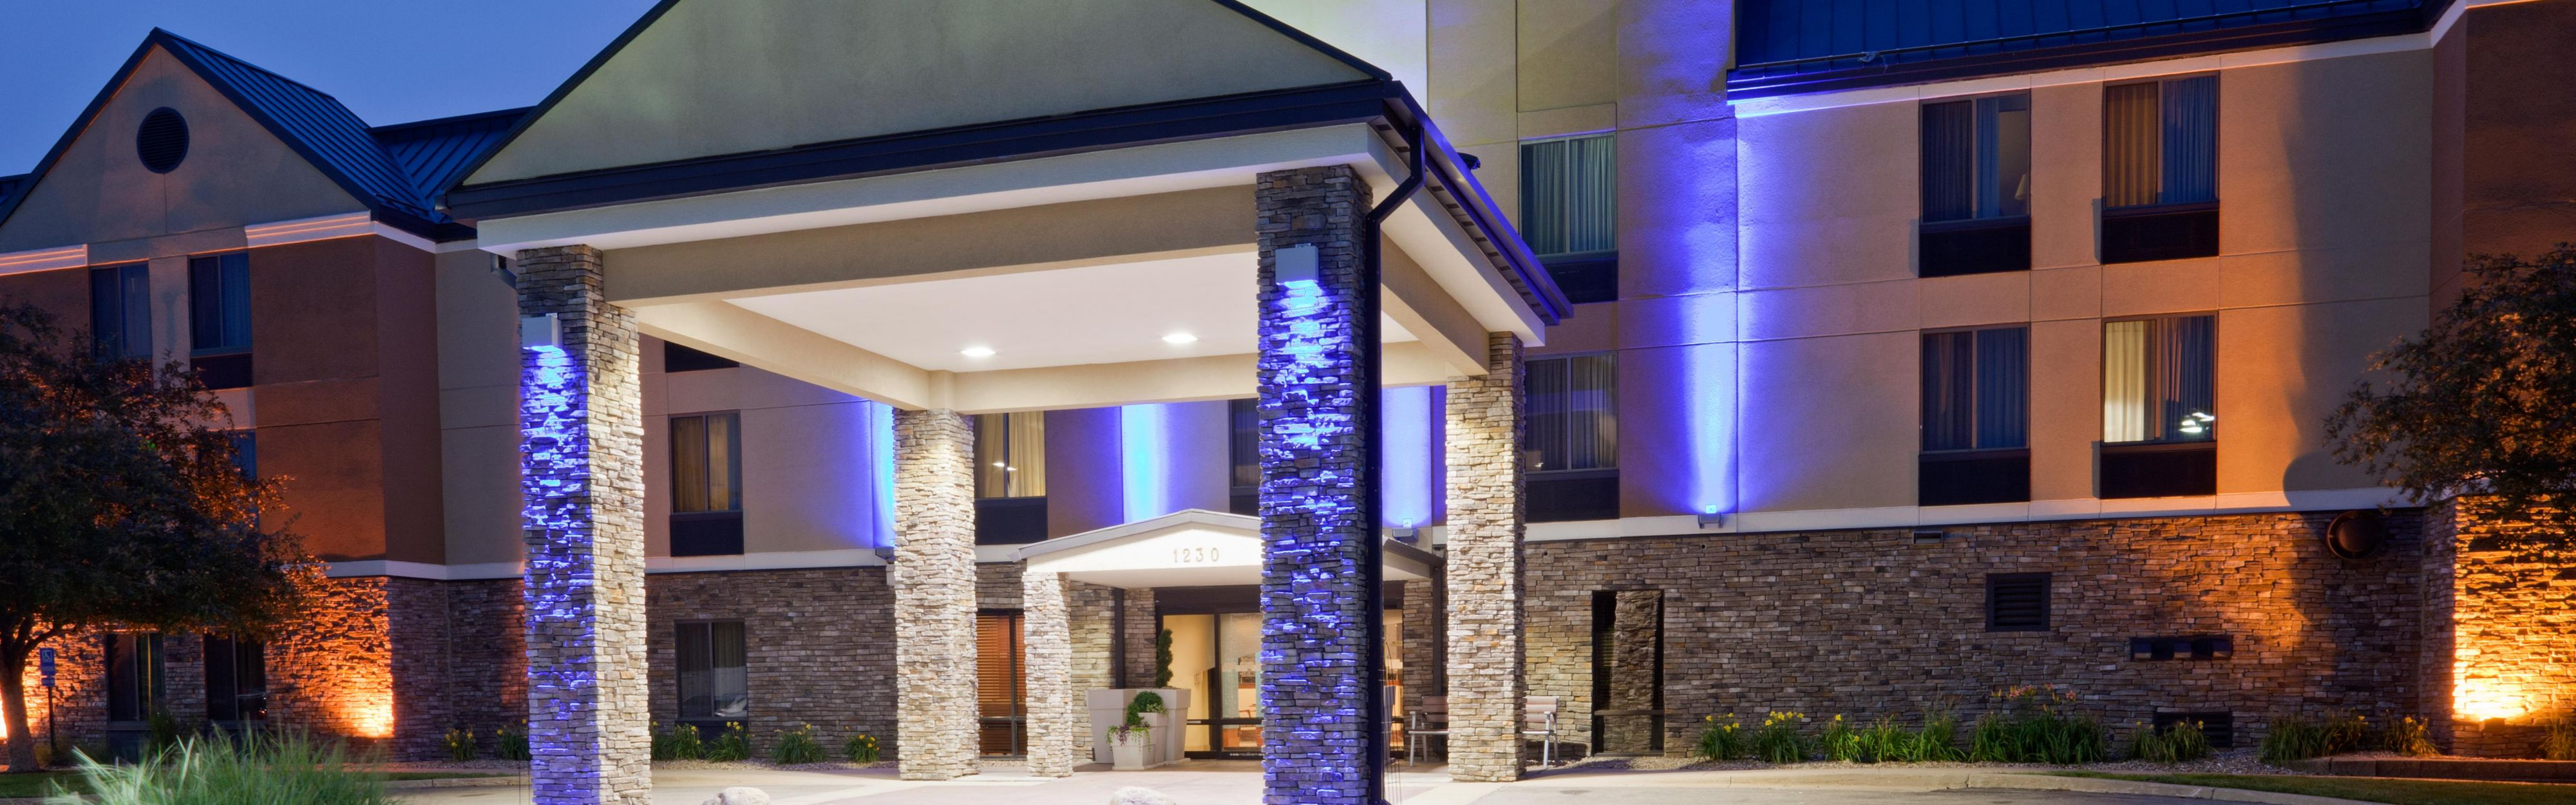 Holiday Inn Express Cedar Rapids (Collins Rd) image 0